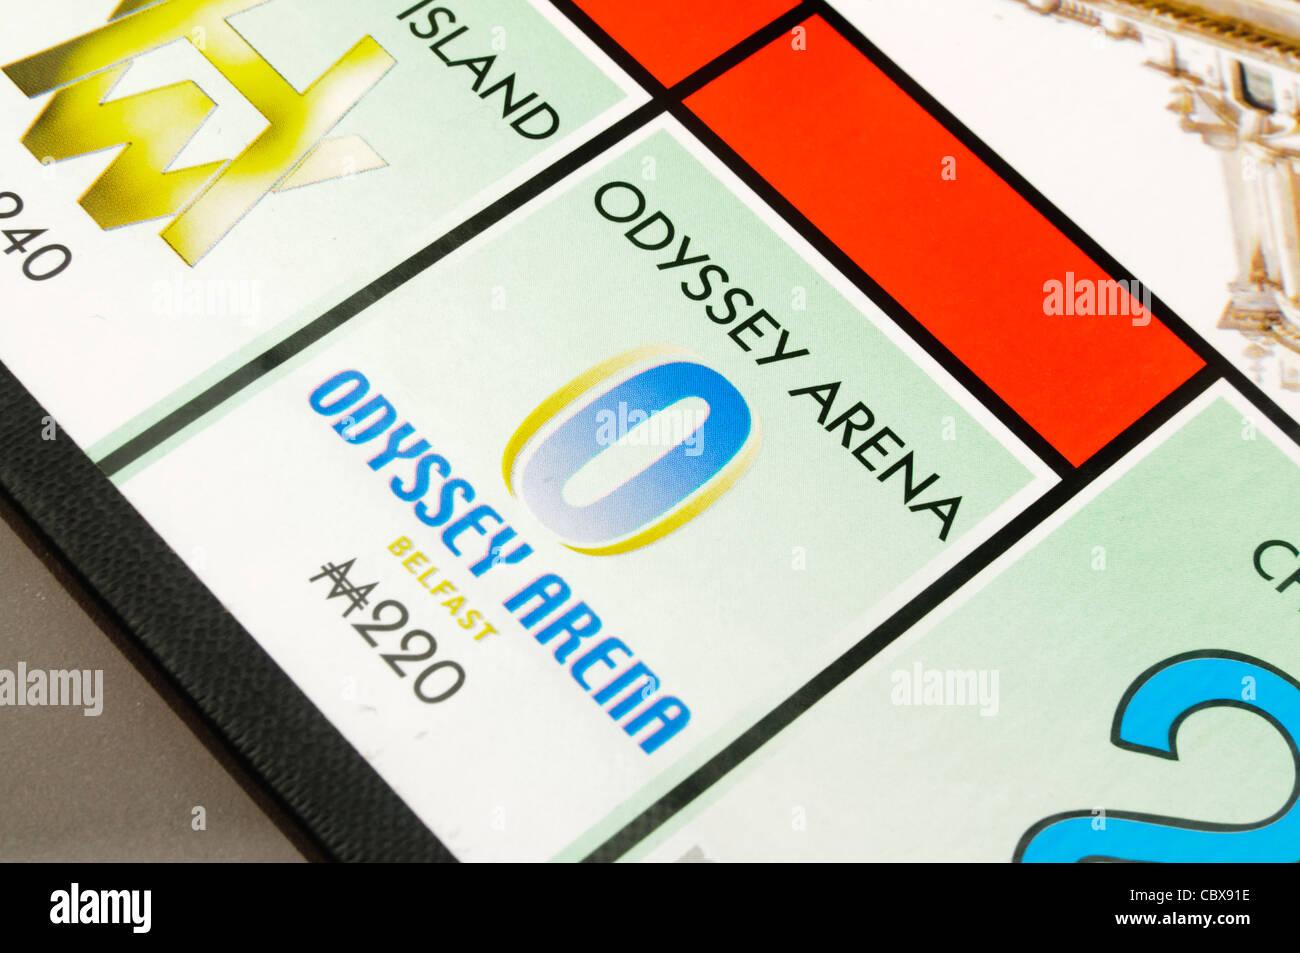 Belfast-Monopol: Odyssey Arena Stockbild